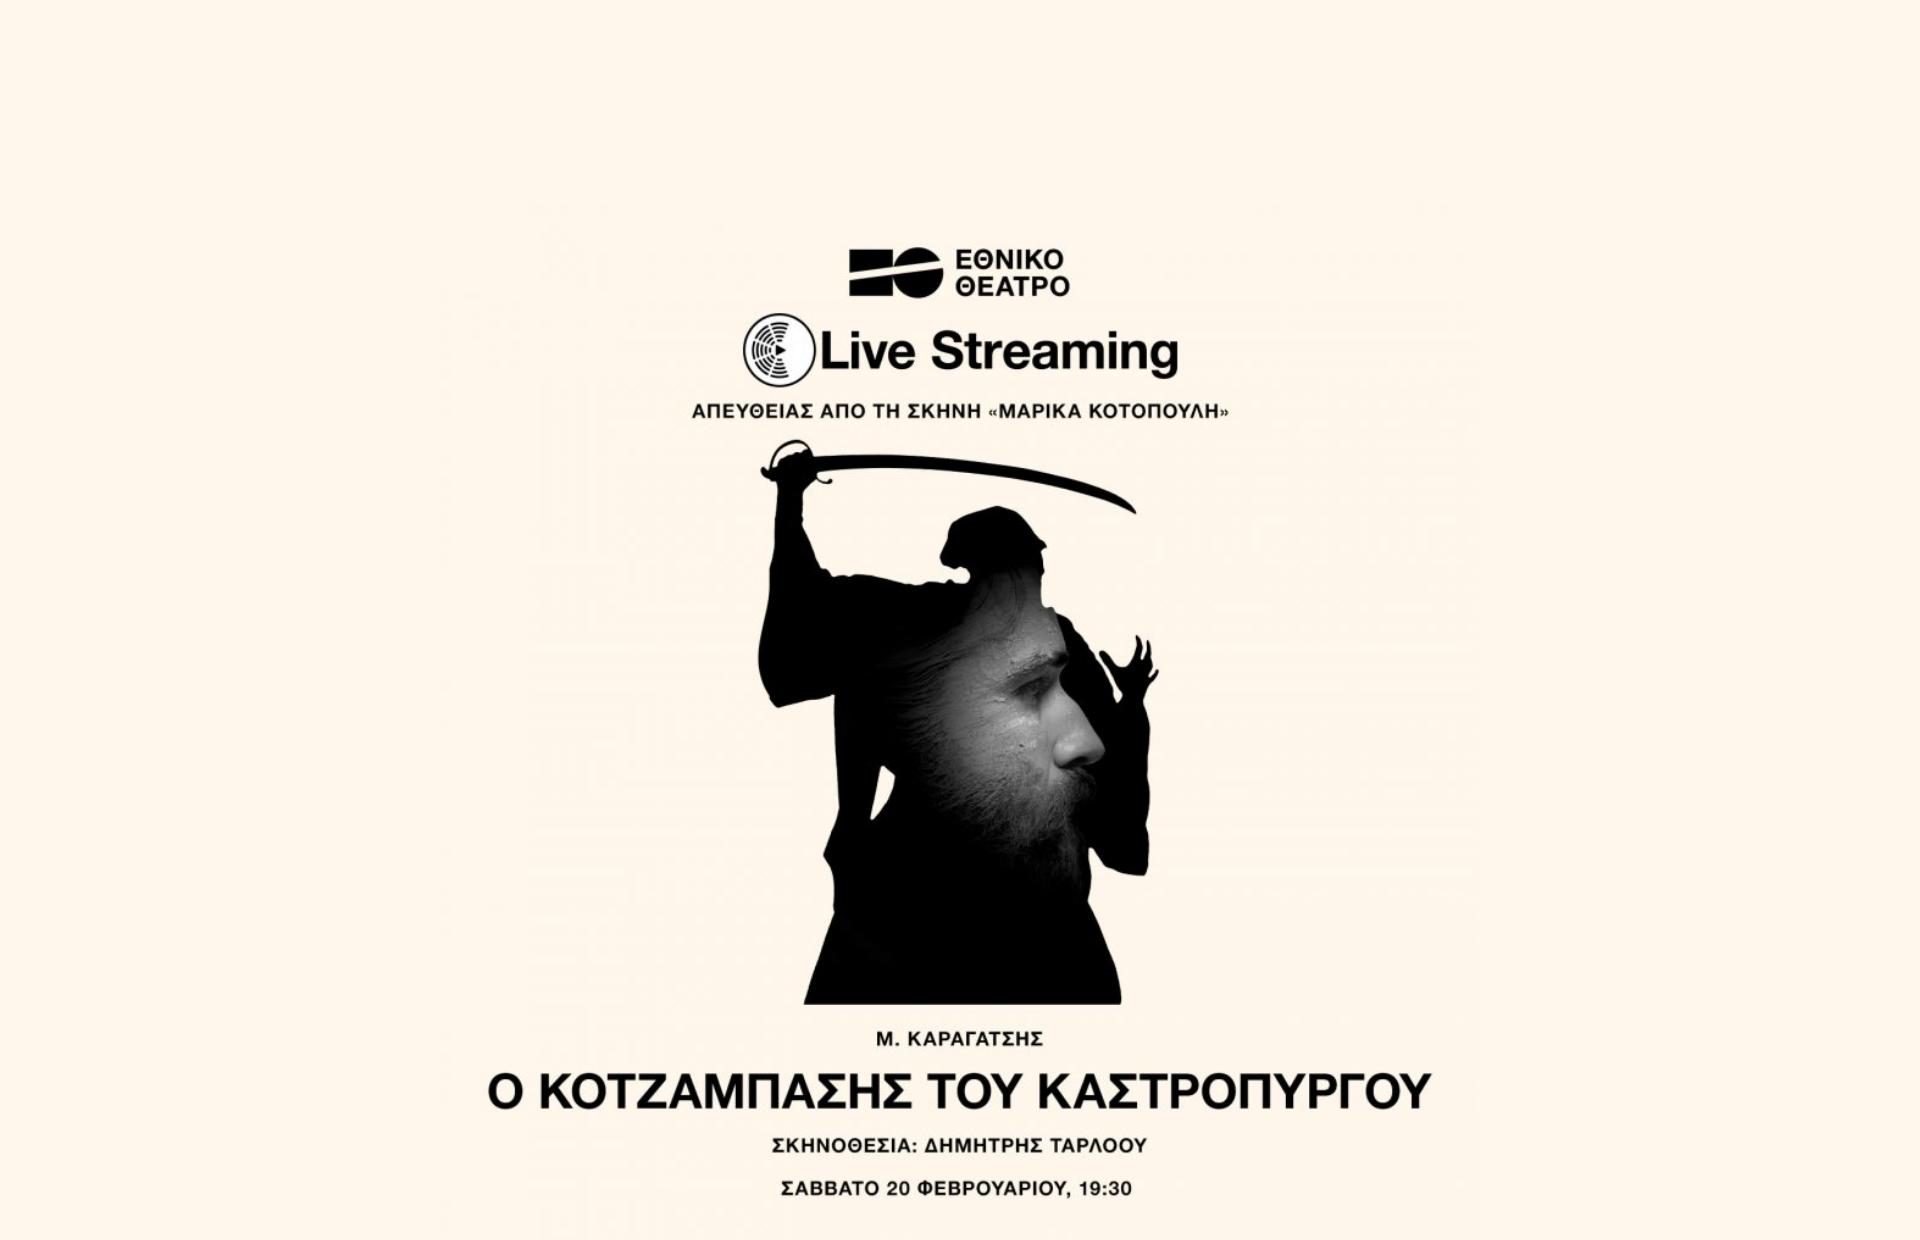 «O Κοτζάμπασης του Καστρόπυργου» του Μ. Καραγάτση, από το Εθνικό Θέατρο